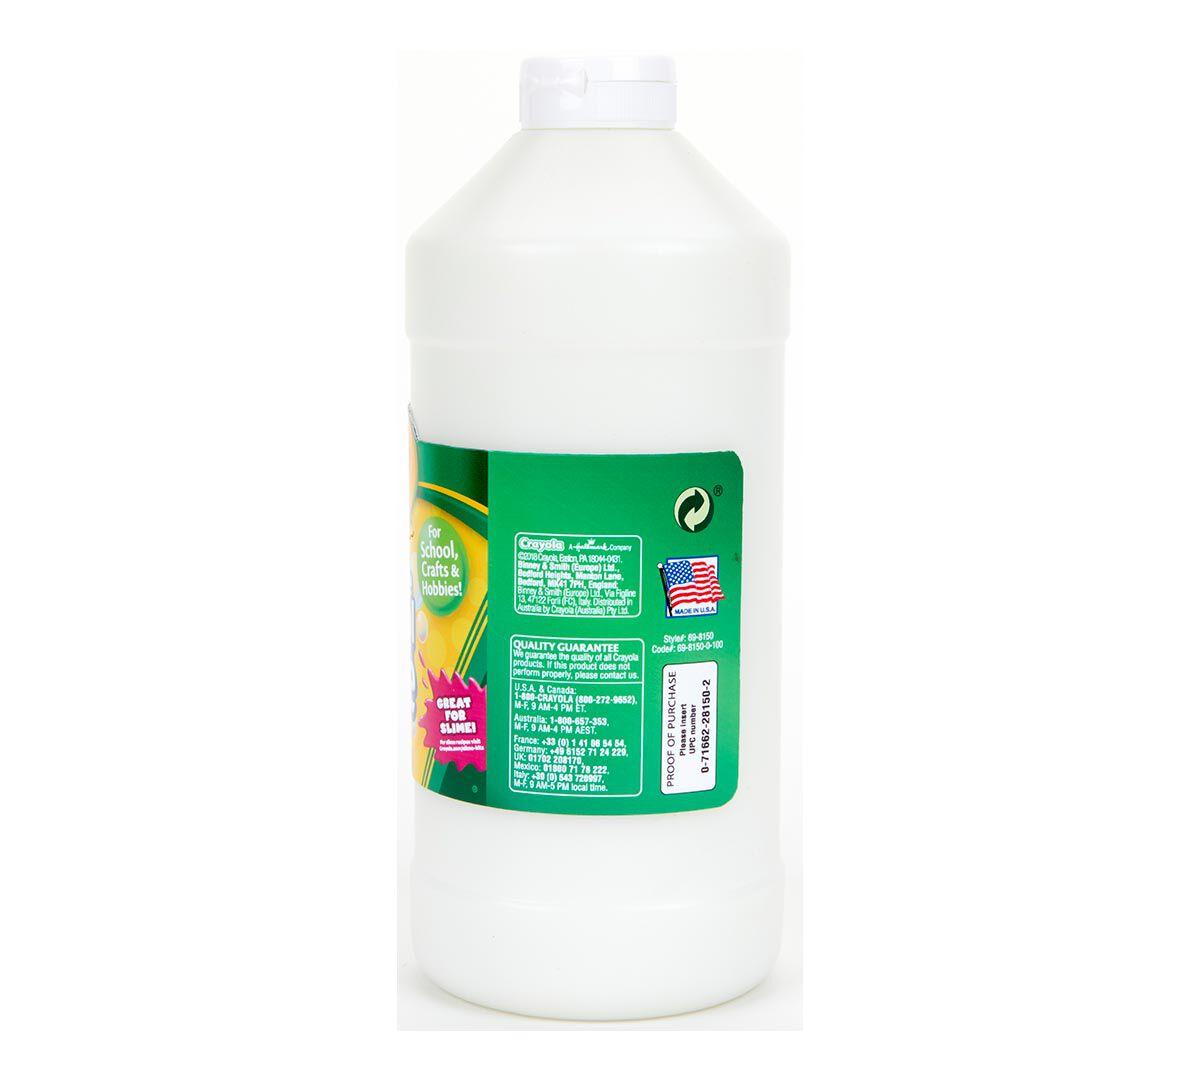 32oz Crayola Washable School Glue For Kids Crayolacom Elmers 225 Ml Sslimeaviv Shop Tictail